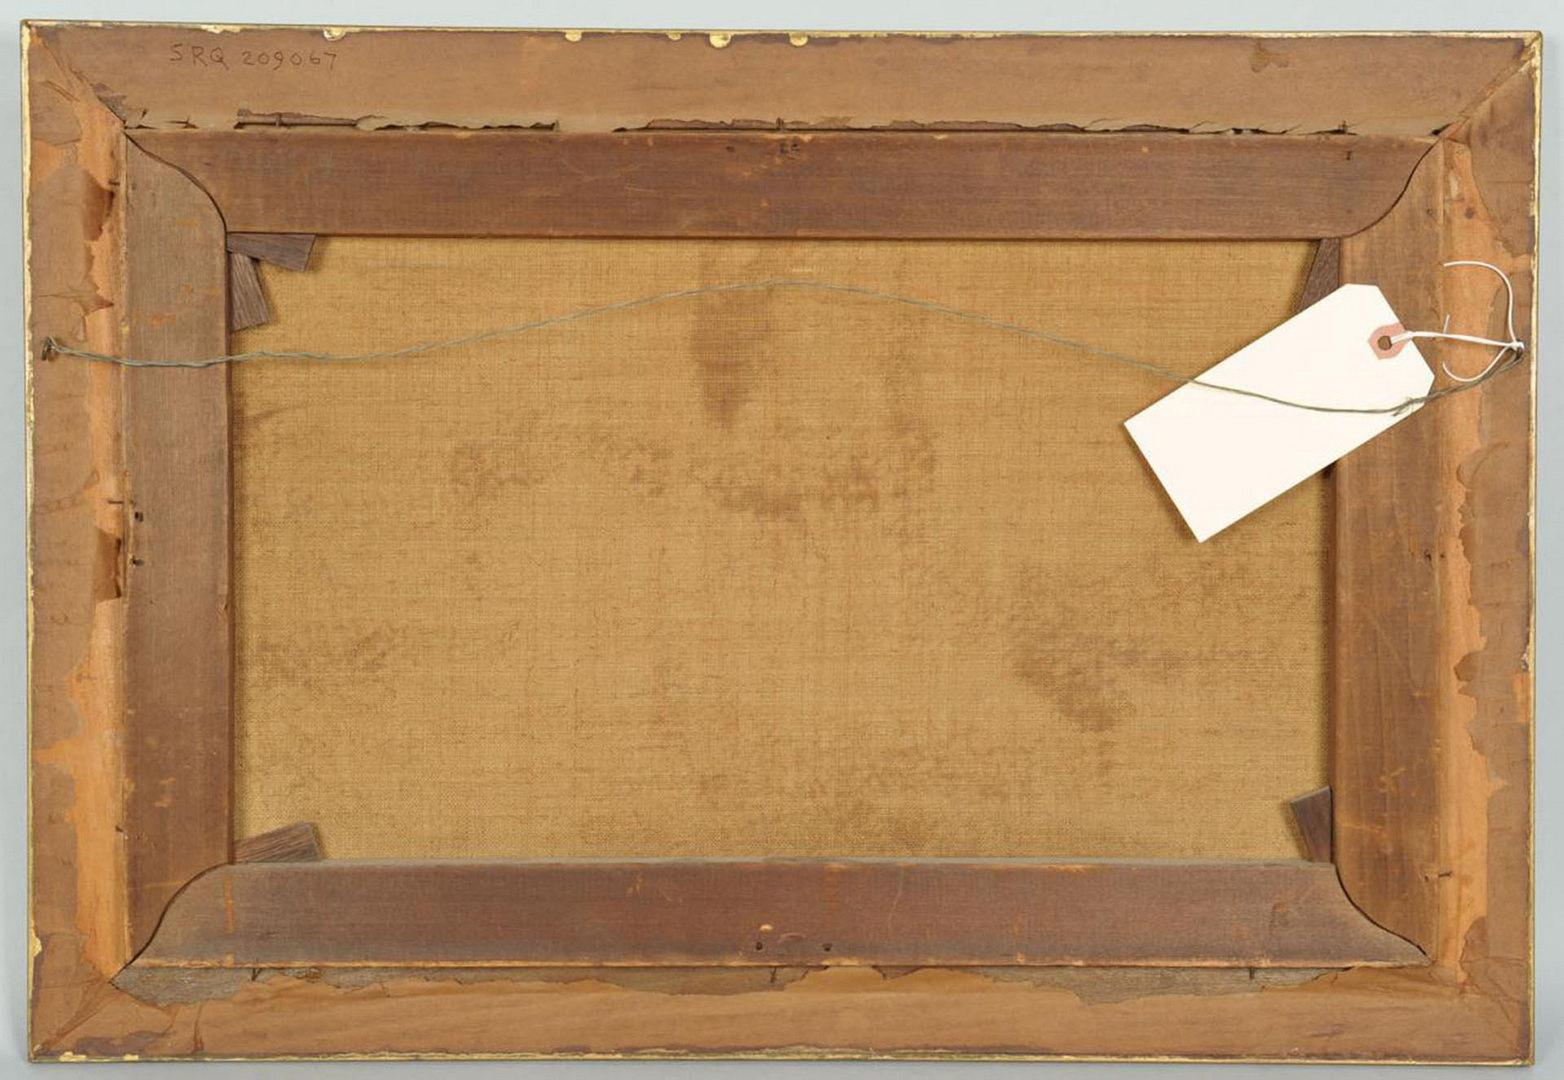 Lot 518: Daniel C. Grose oil on canvas, Indian Bazaar